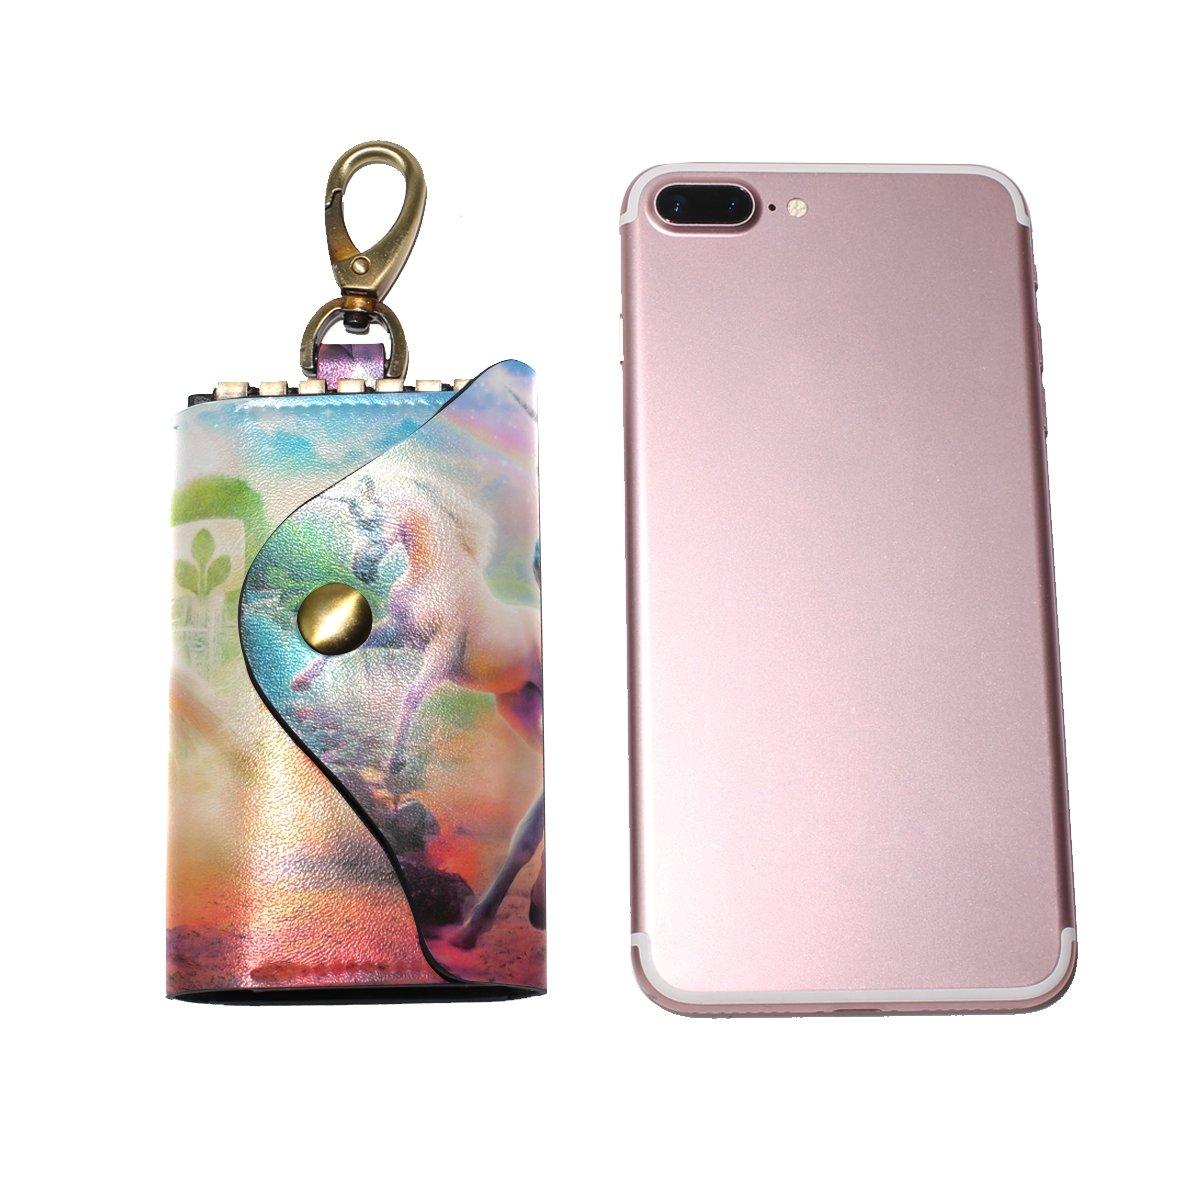 DEYYA Fox Leather Key Case Wallets Unisex Keychain Key Holder with 6 Hooks Snap Closure